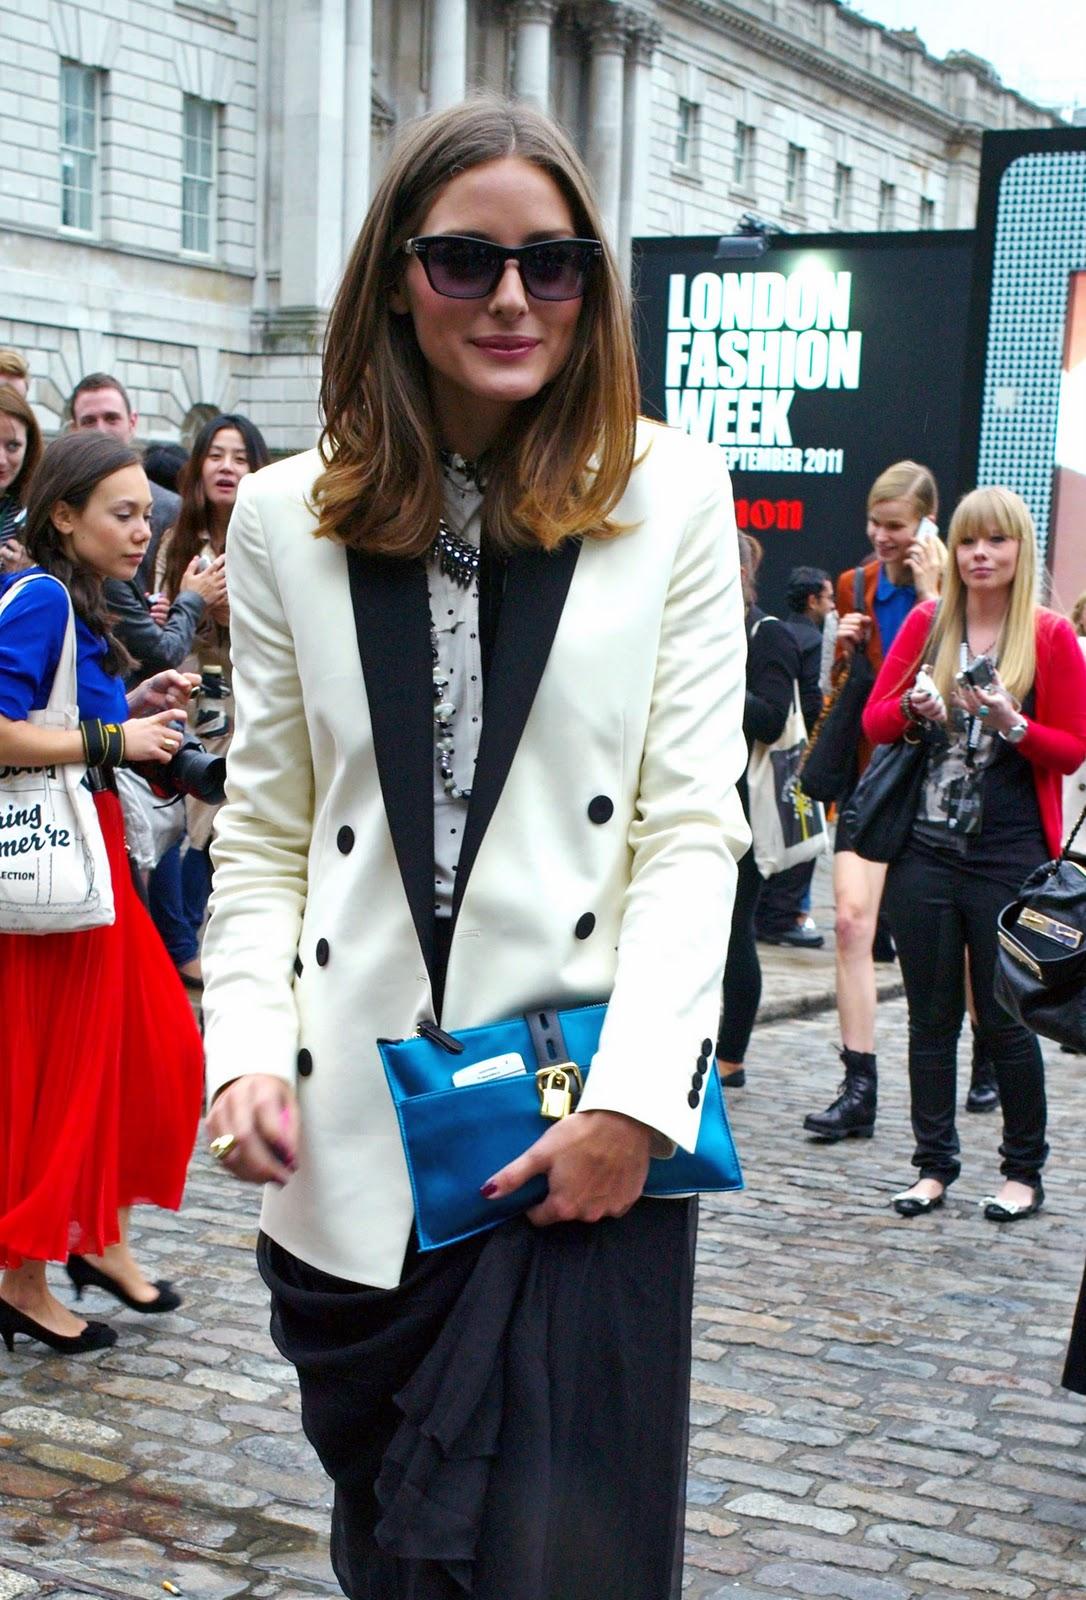 http://4.bp.blogspot.com/-iRM0AFe-xV4/Tnc-MEYxSKI/AAAAAAAAGxM/tB9VvGKVQZY/s1600/London+Fashion+Week+%25E2%2580%2593+Jager+SS+2012+1.jpg